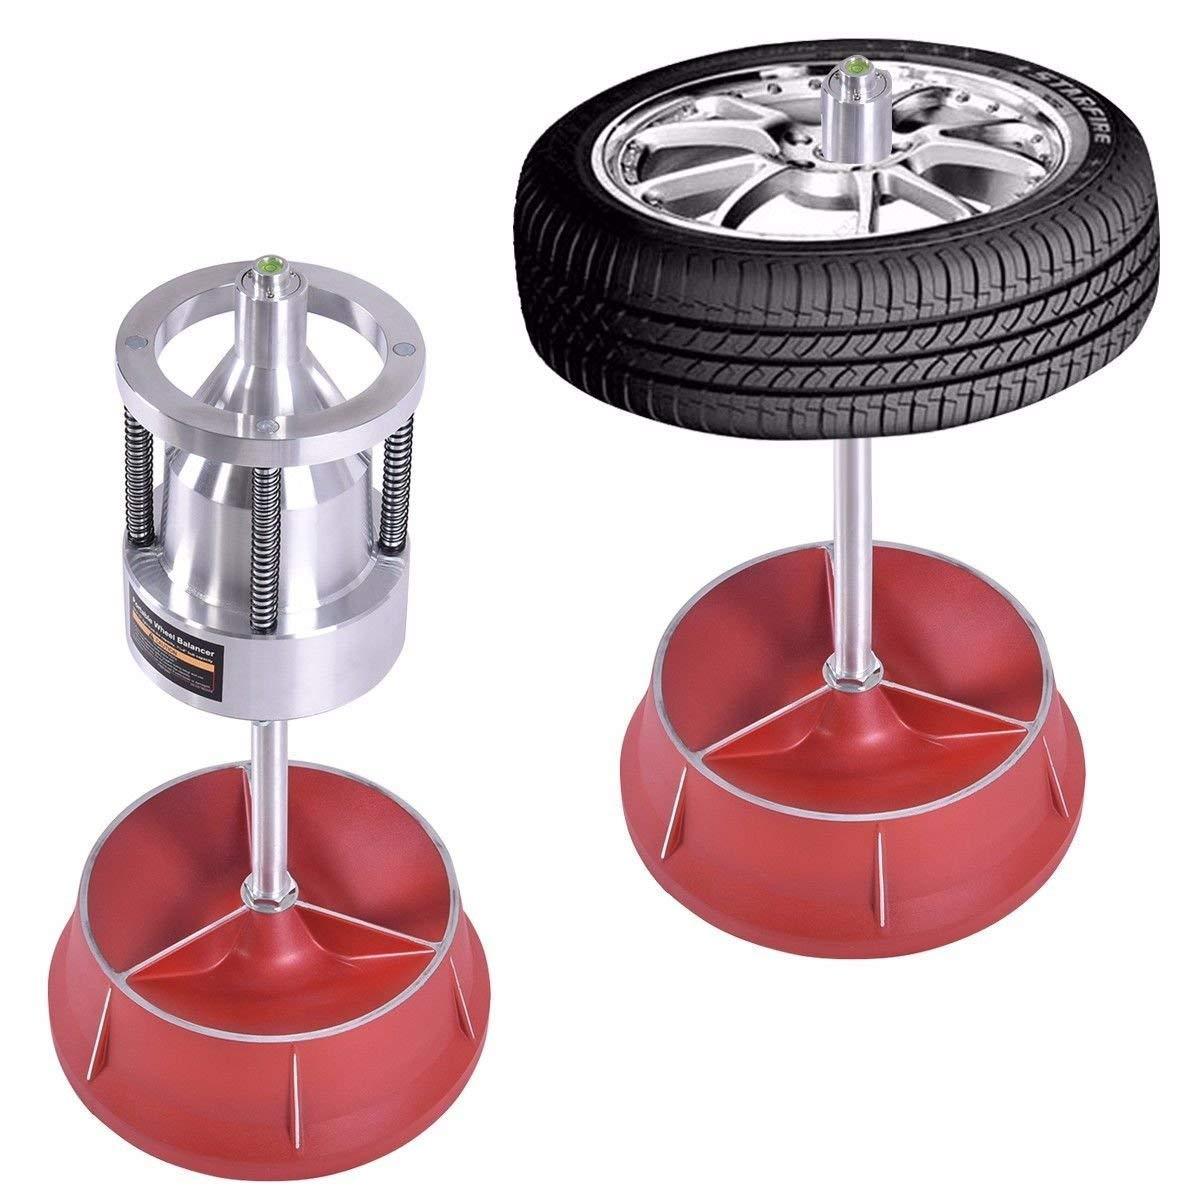 Pro Portable Hubs Wheel Balancer W/Bubble Level Heavy Duty Rim Tire Cars Truck Machined Aluminum